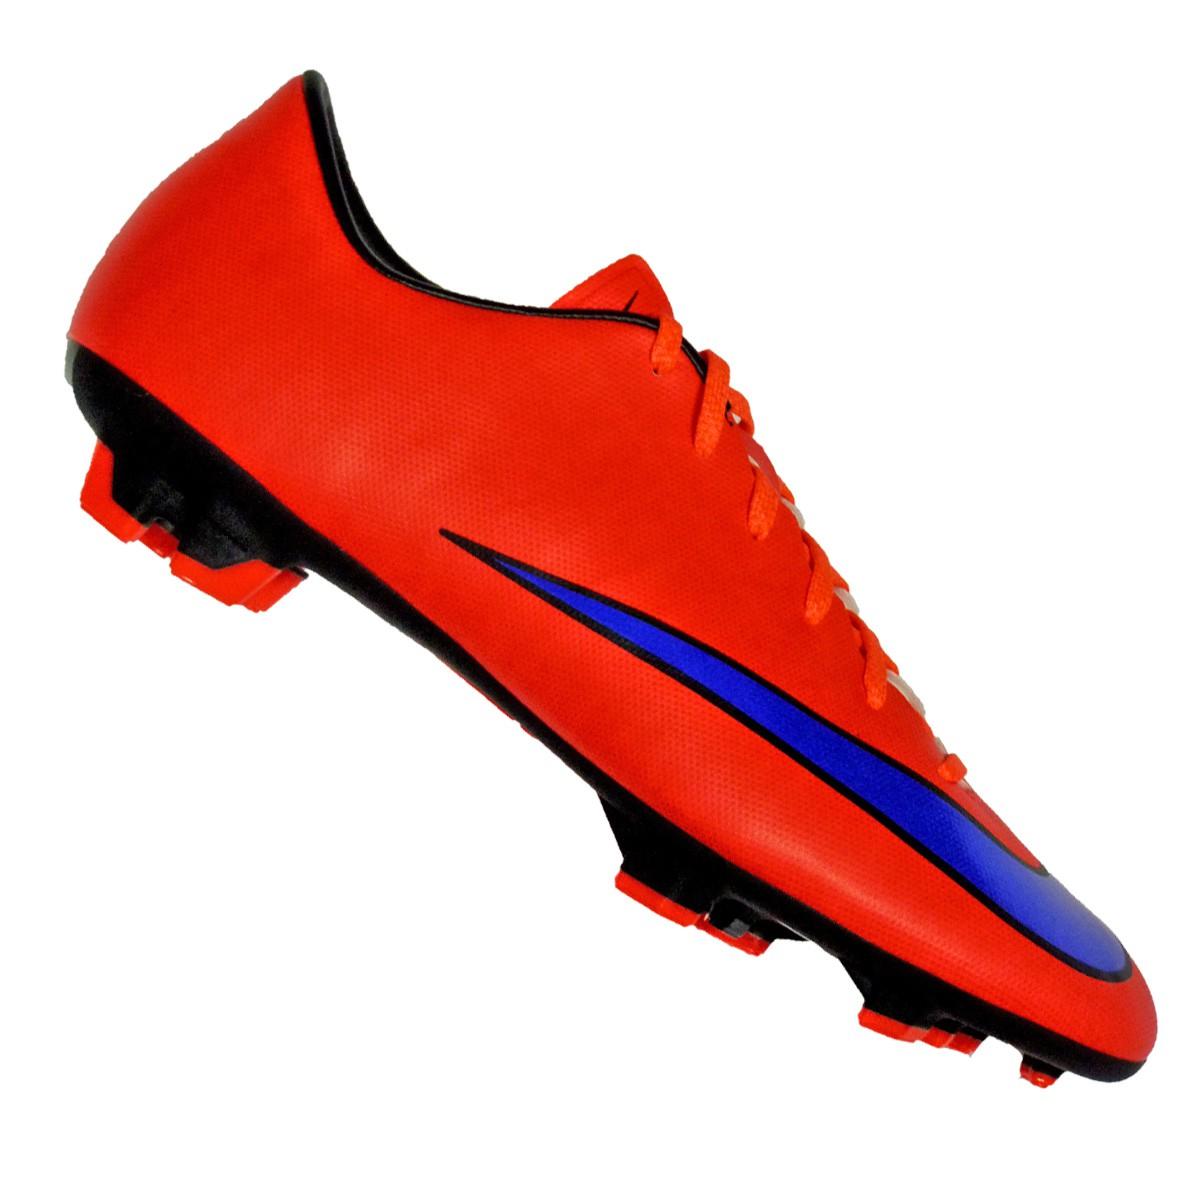 Details zu Nike Mercurial Victory V FG Herren Fussballschuhe rot violett Neu